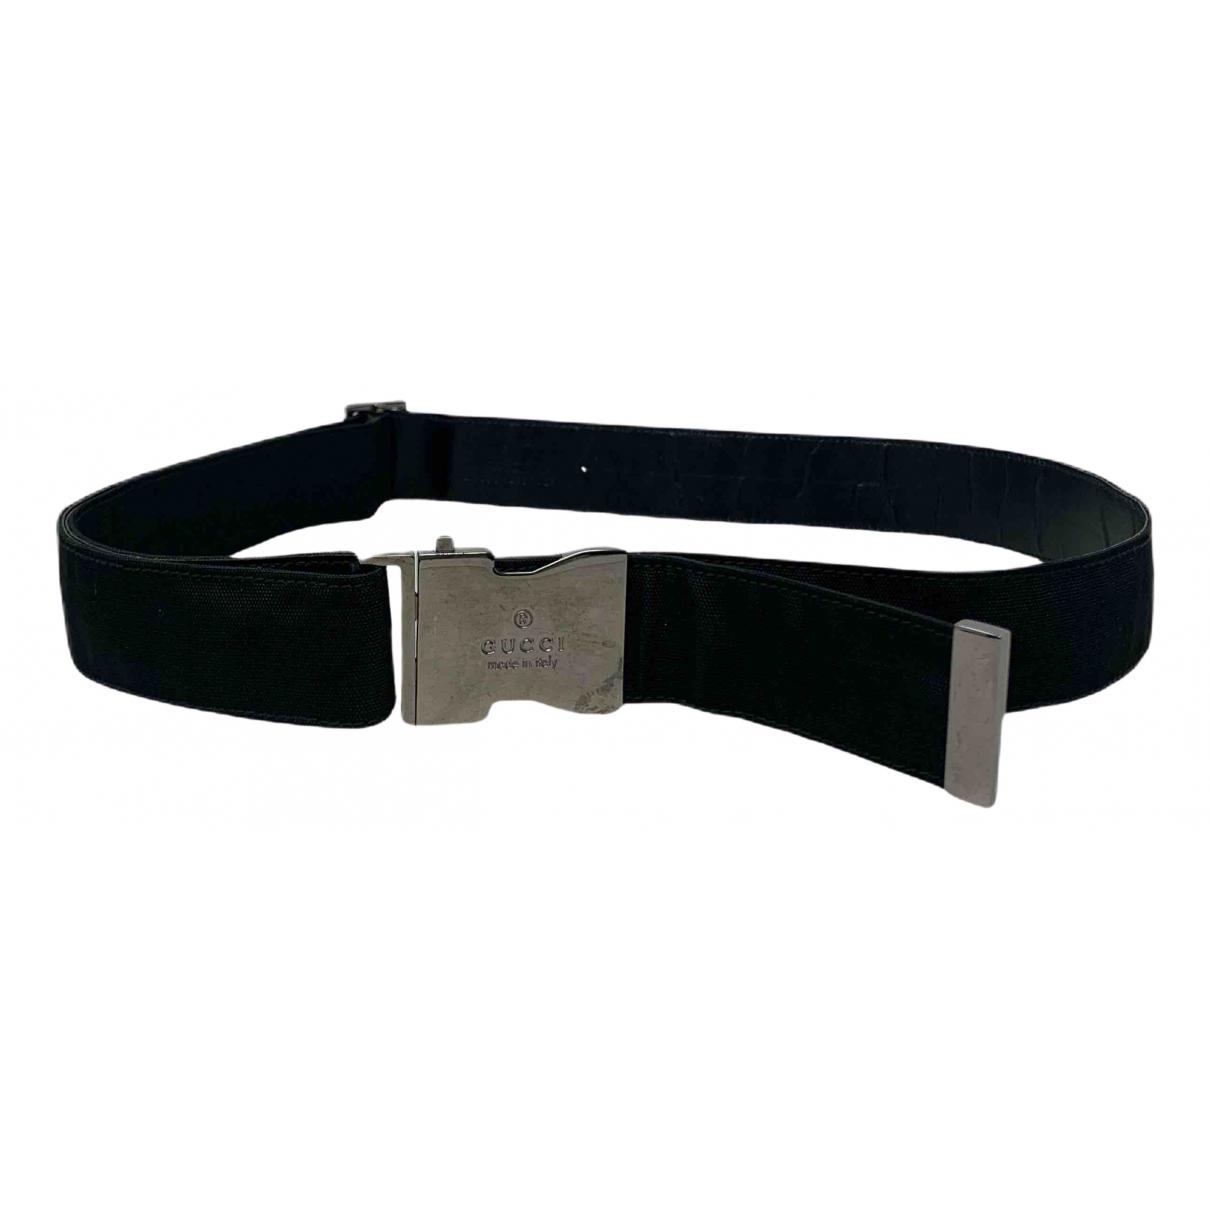 Gucci N Black Cloth belt for Women 70 cm